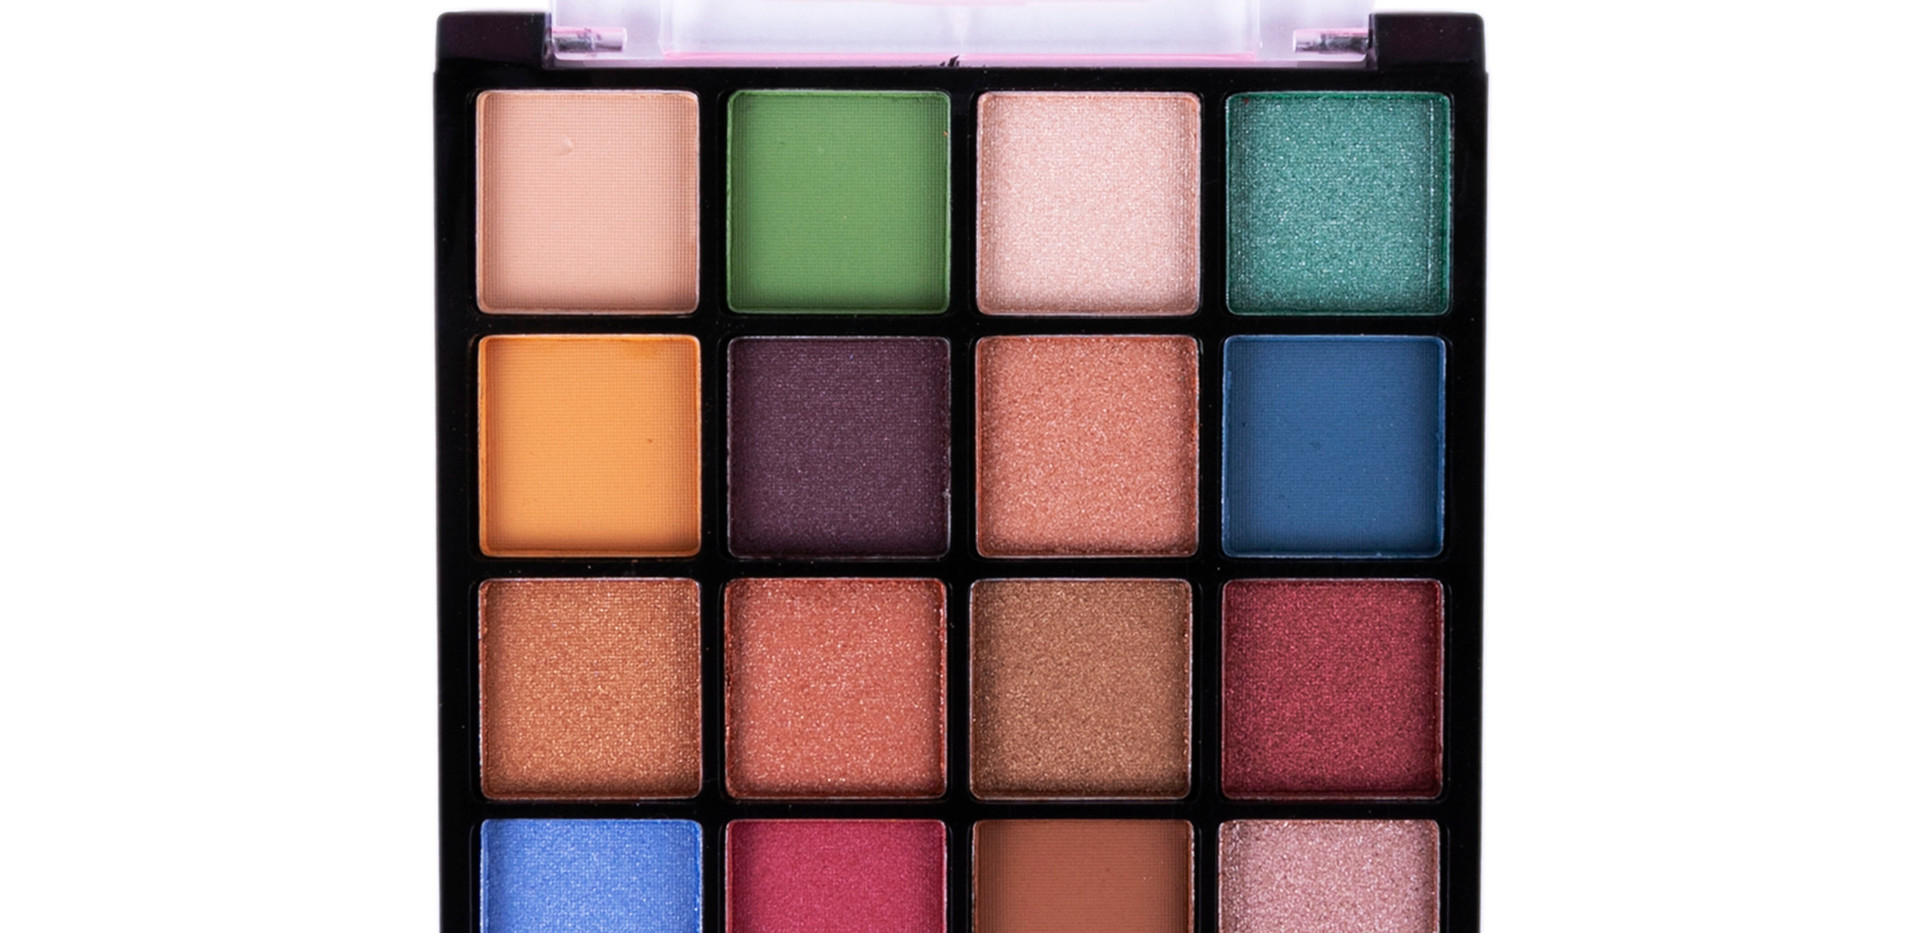 Paleta de Sombras Over the Rainbow Dapop - HB96728 (cor 1)